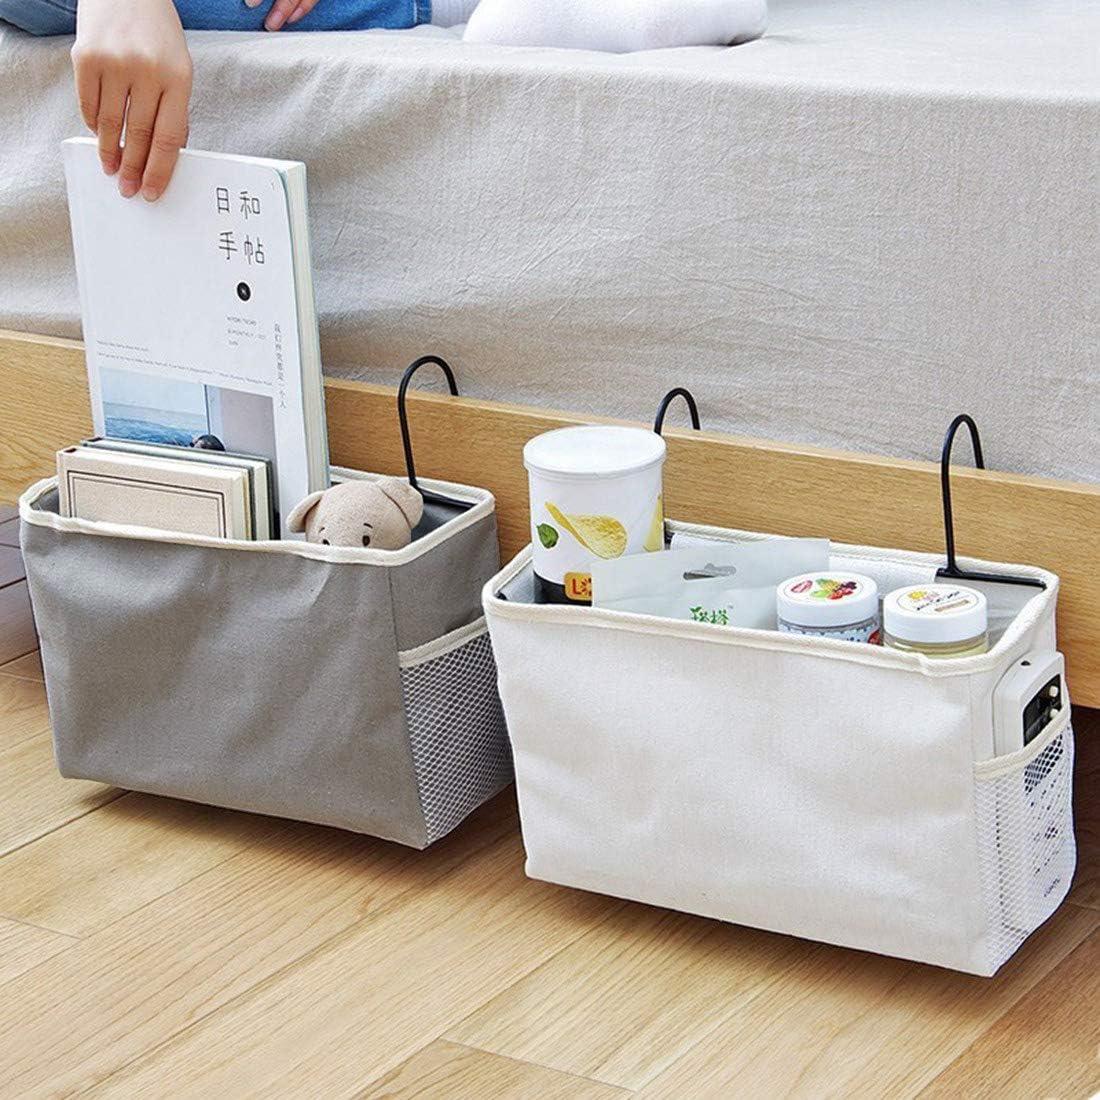 Bed Bag with Hanging Hook Mobile Phone Nati Bed Organiser Hanging Bag Cabin Bed Hanging Storage Bag Cabin Bed Hanging Bag for Book White Headphones